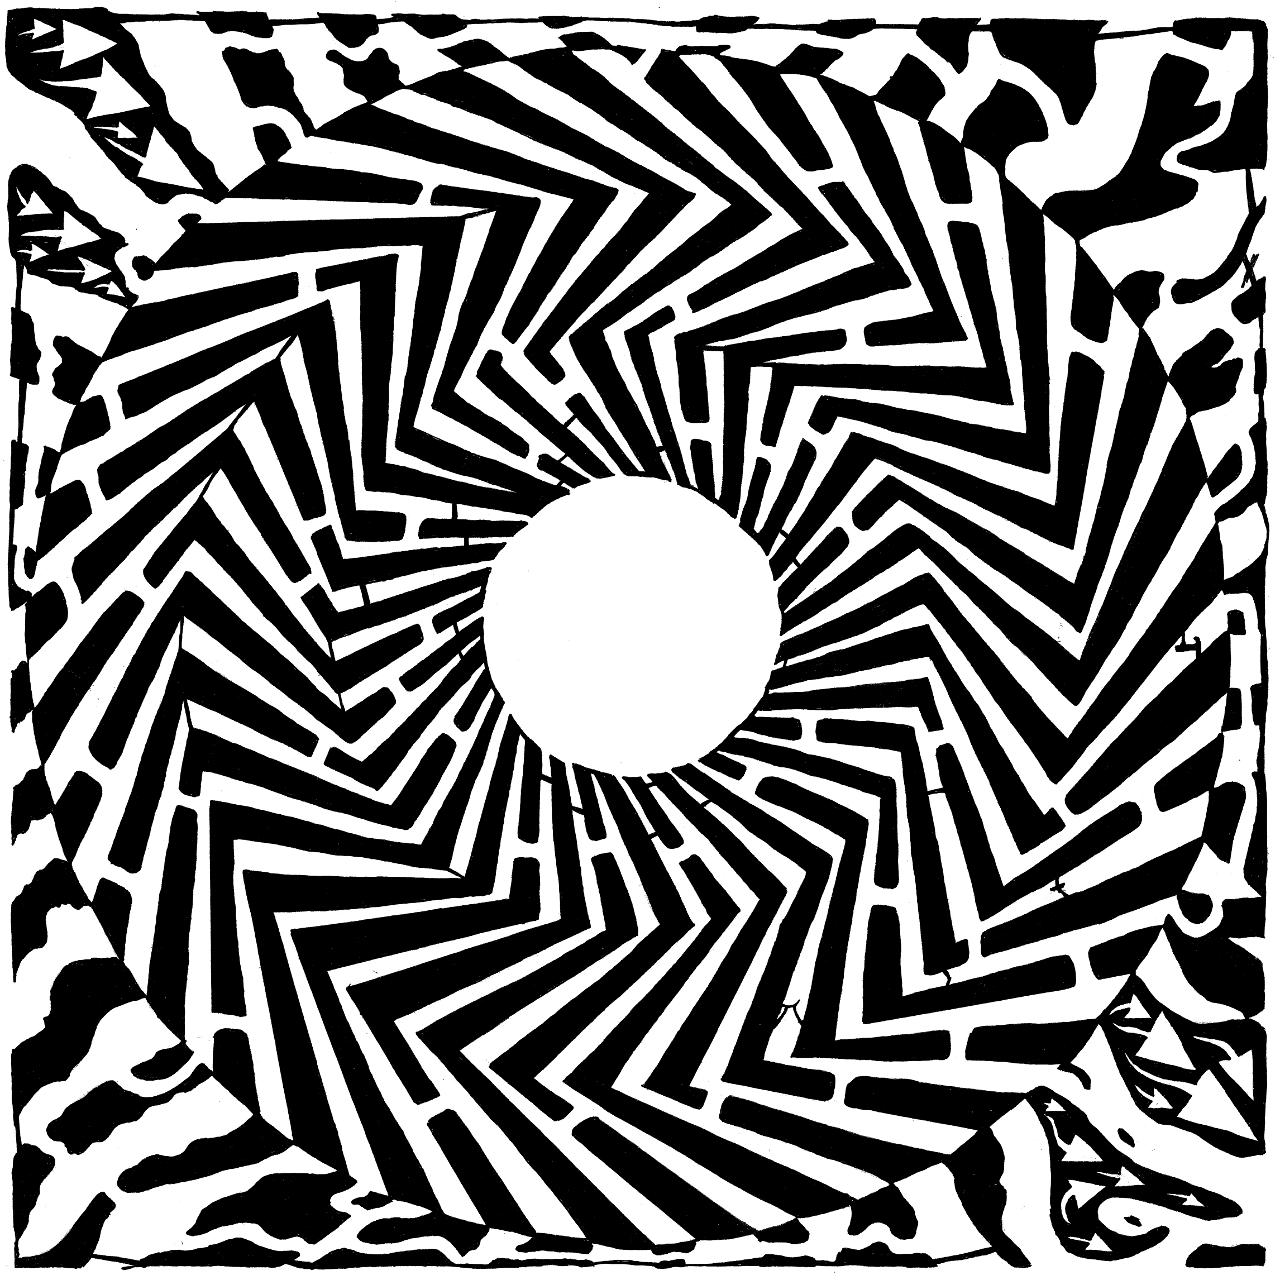 1280x1280 Psychedelic Maze Optical Illusion Yonatan Frimer Optical